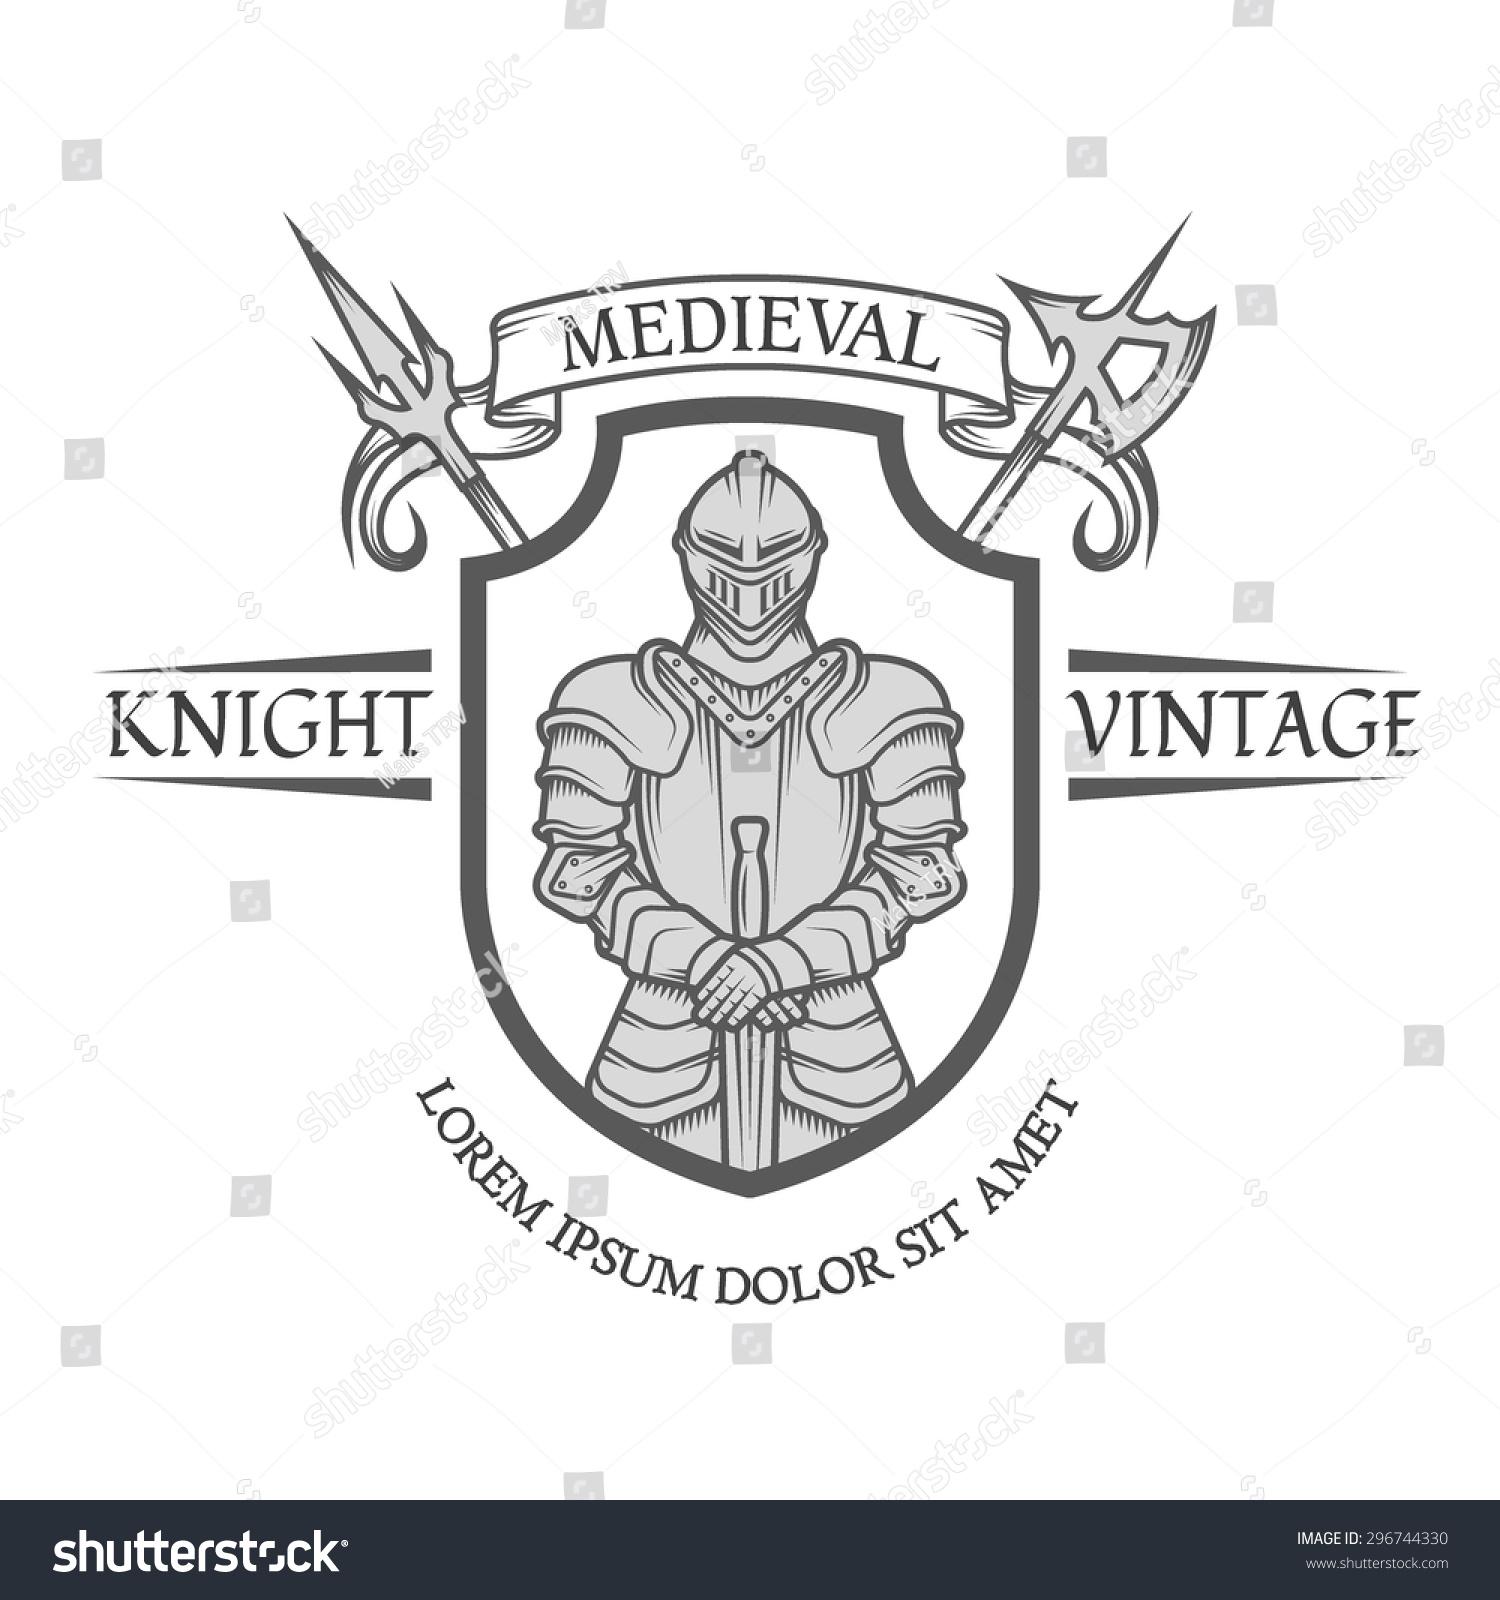 Knight warrior armor sword heraldic emblem stock vector 296744330 knight warrior in armor with a sword heraldic emblem in the medieval style biocorpaavc Gallery